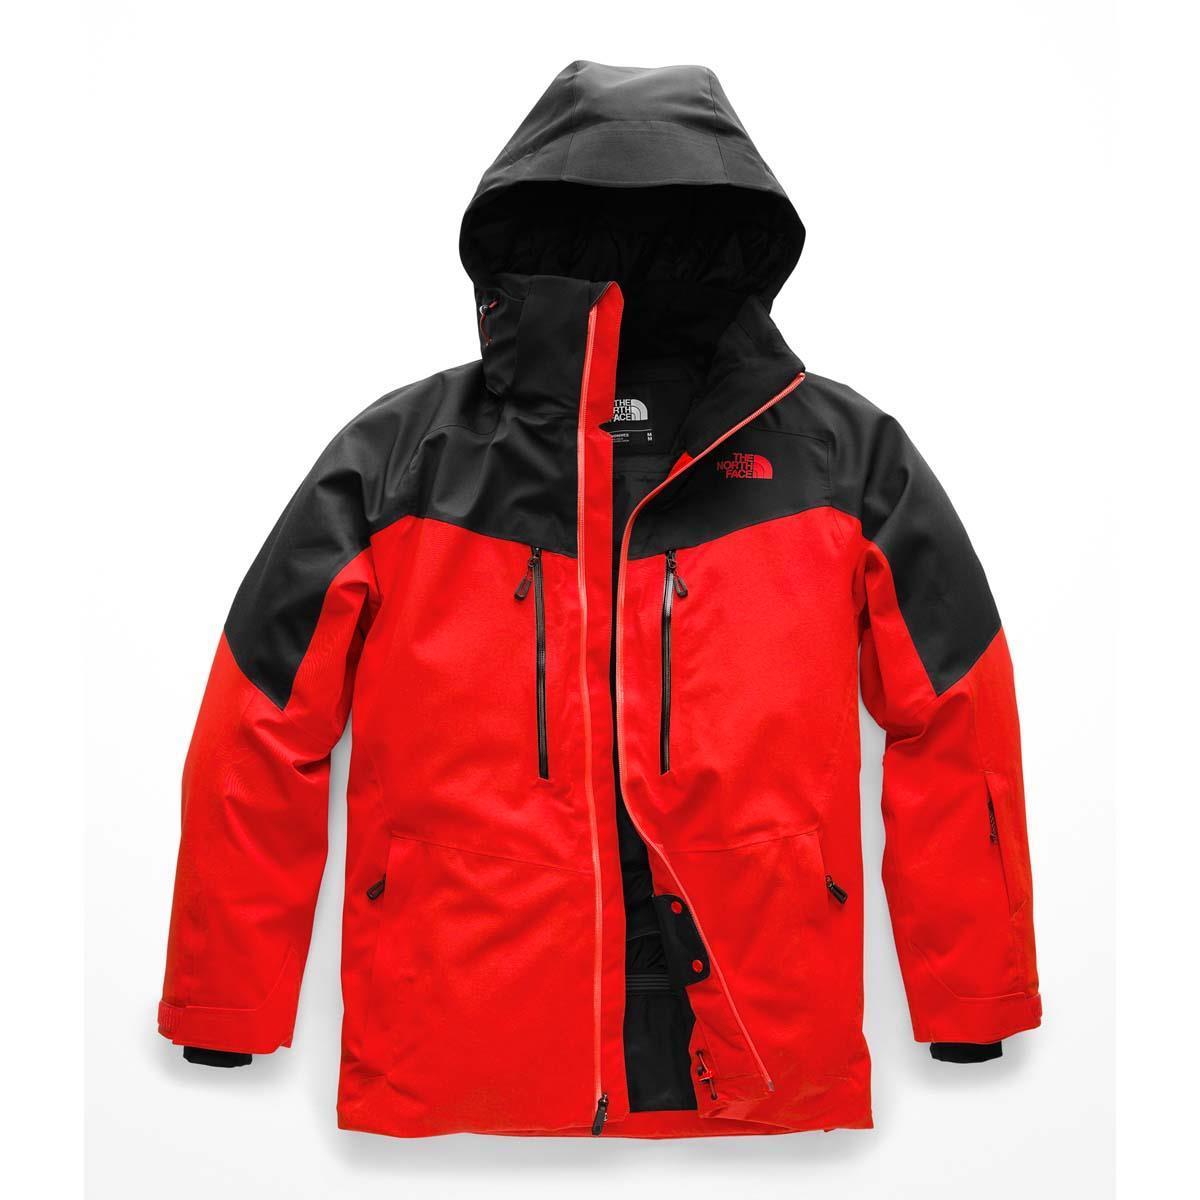 75e61daa0 The North Face Chakal Jacket - Men's